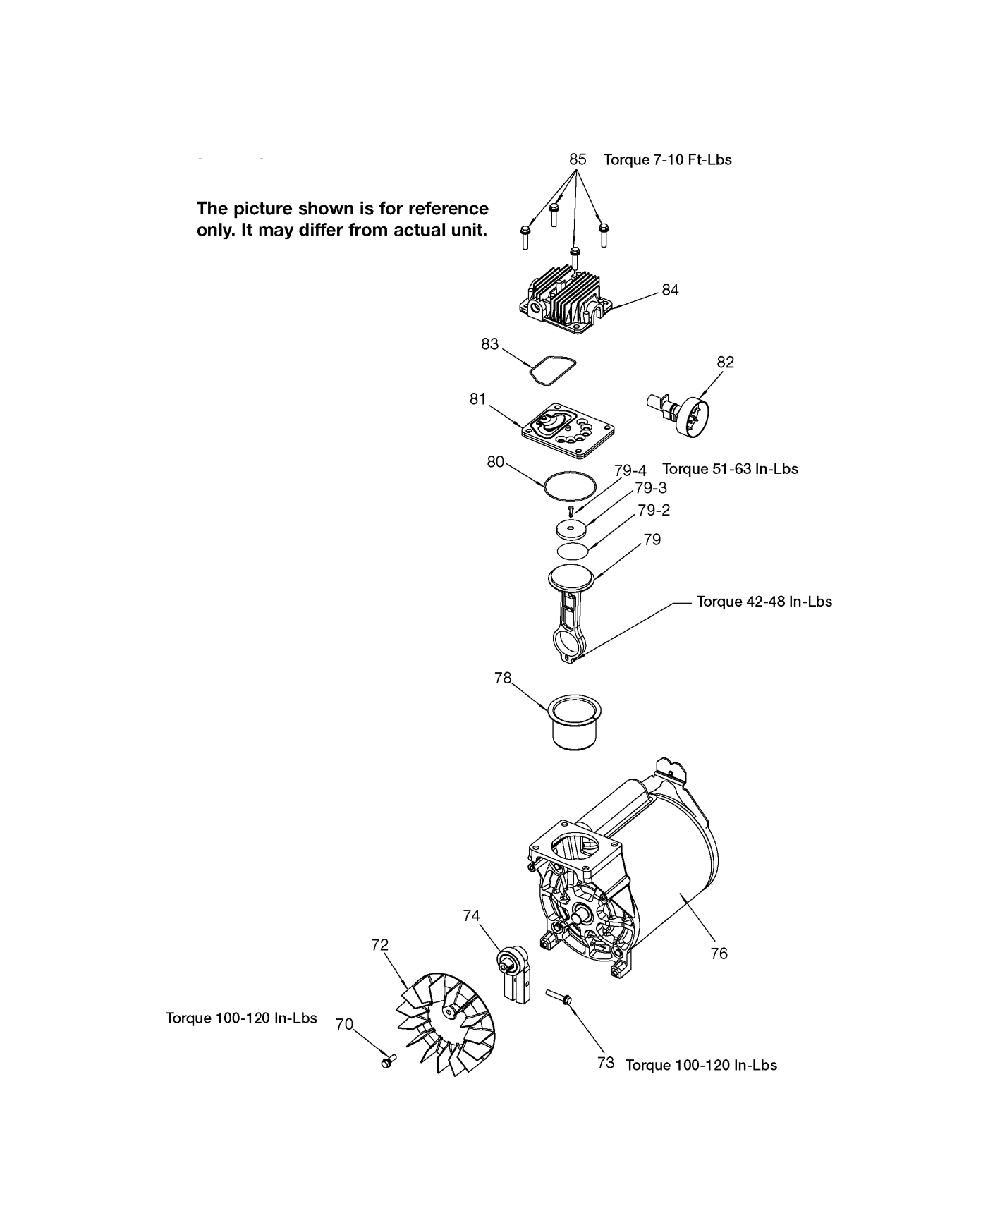 919-16721-Devilbiss-T1-PB-1Break Down